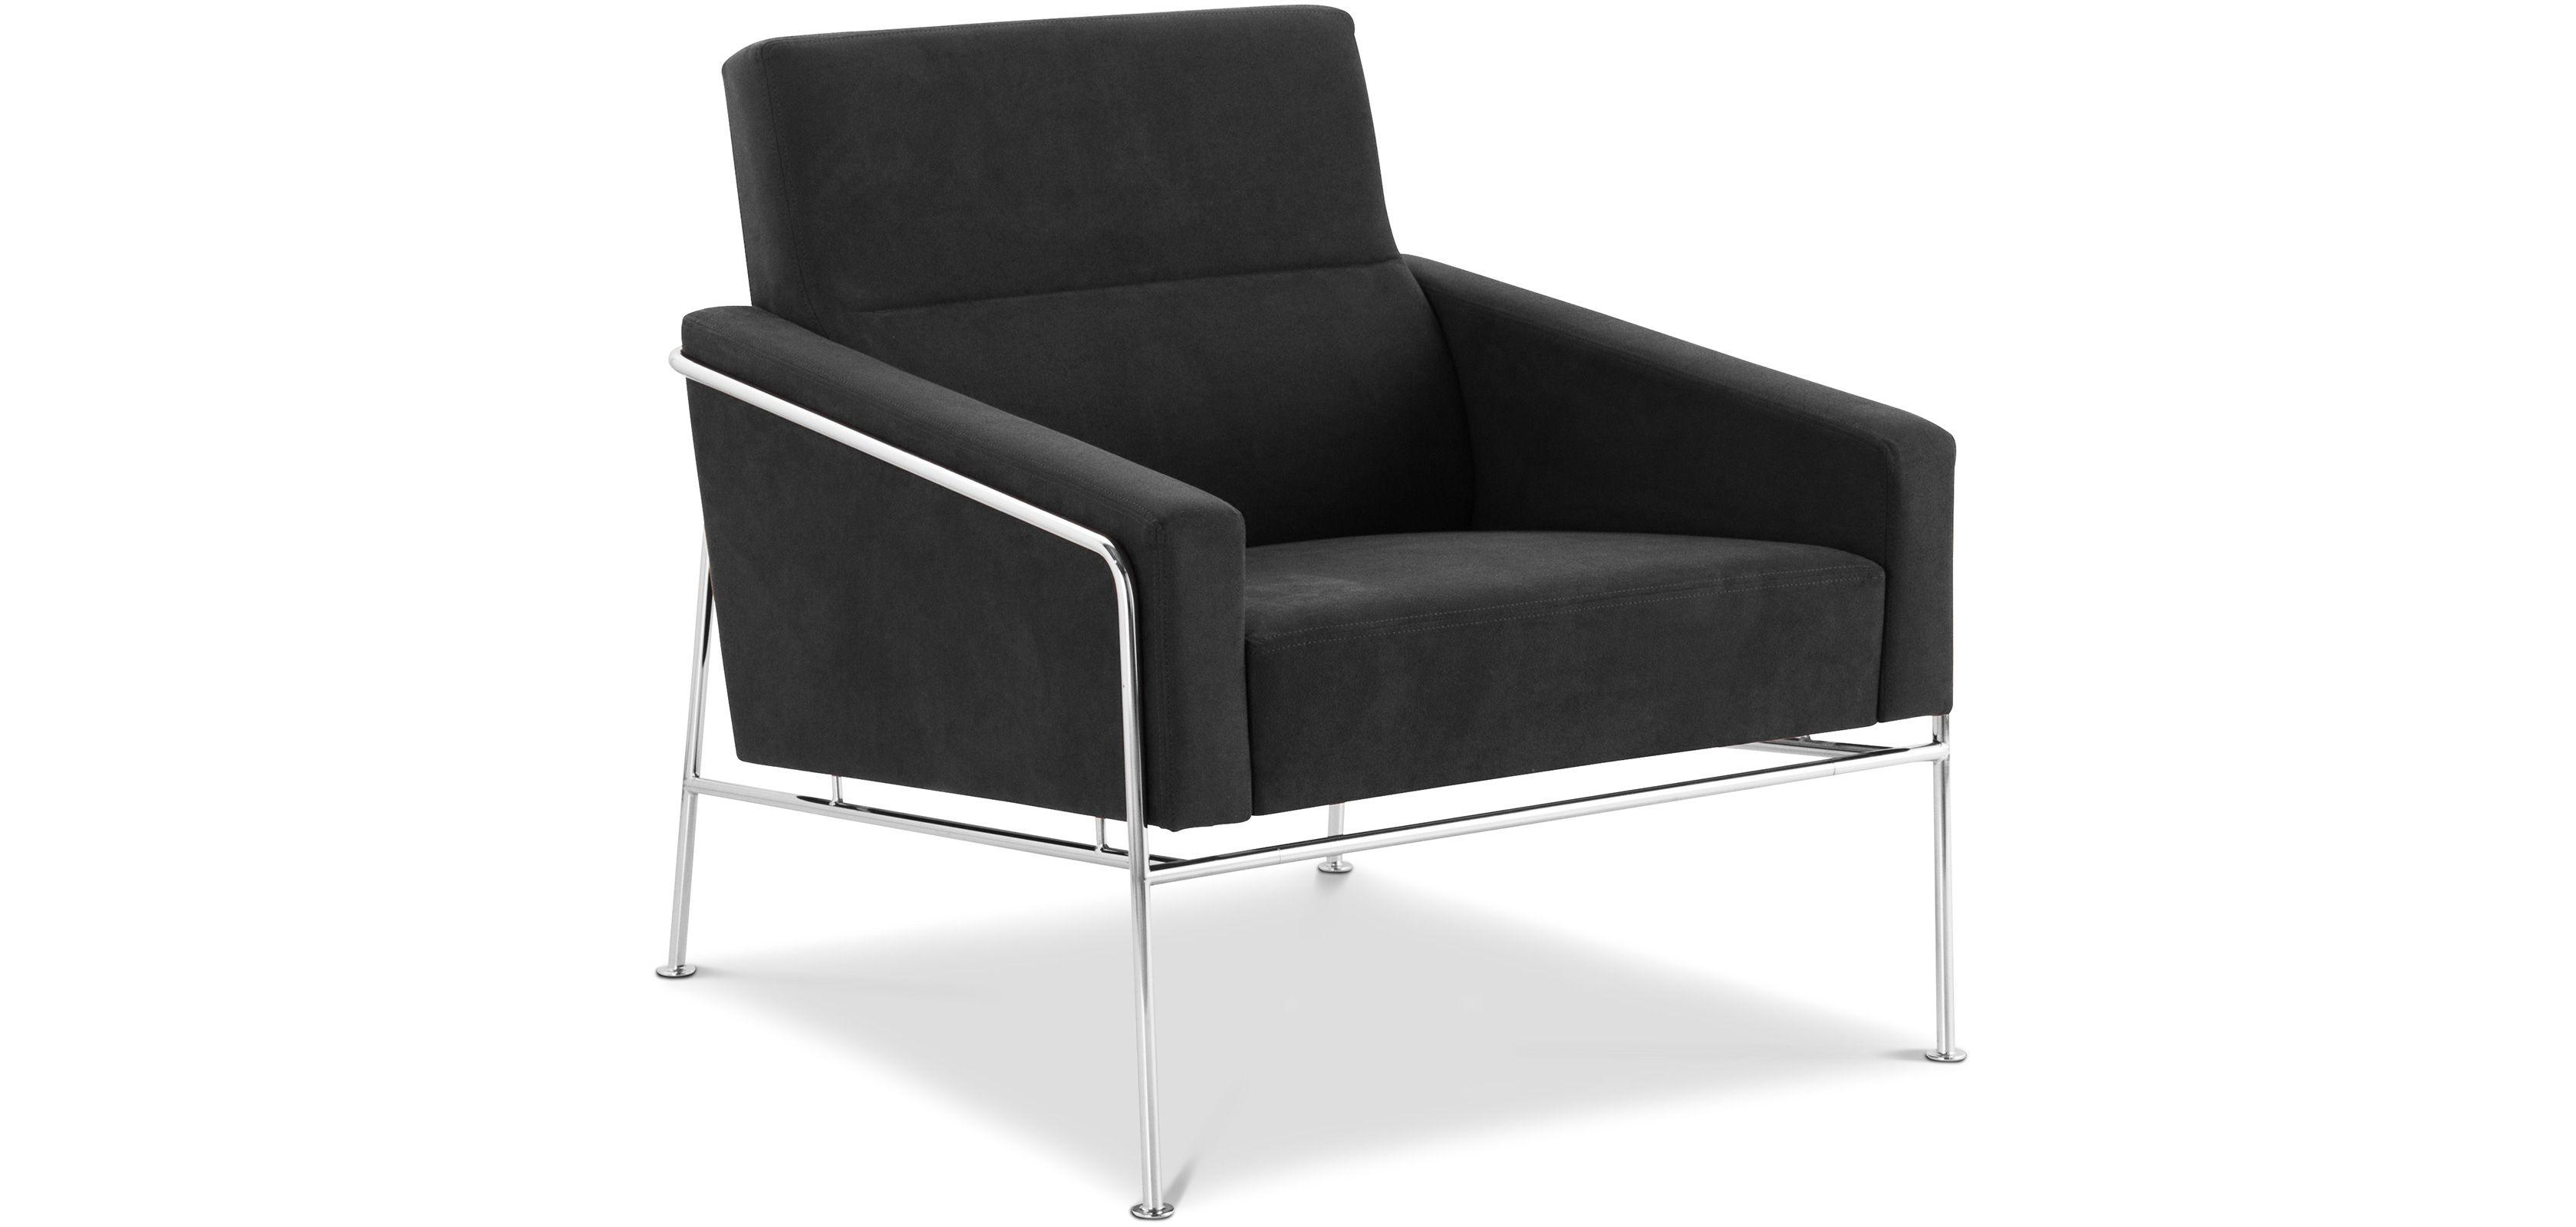 Fauteuil de salon design 3300 easy chair style arne jacobsen tissu chairs chair living - Fauteuils salon design ...